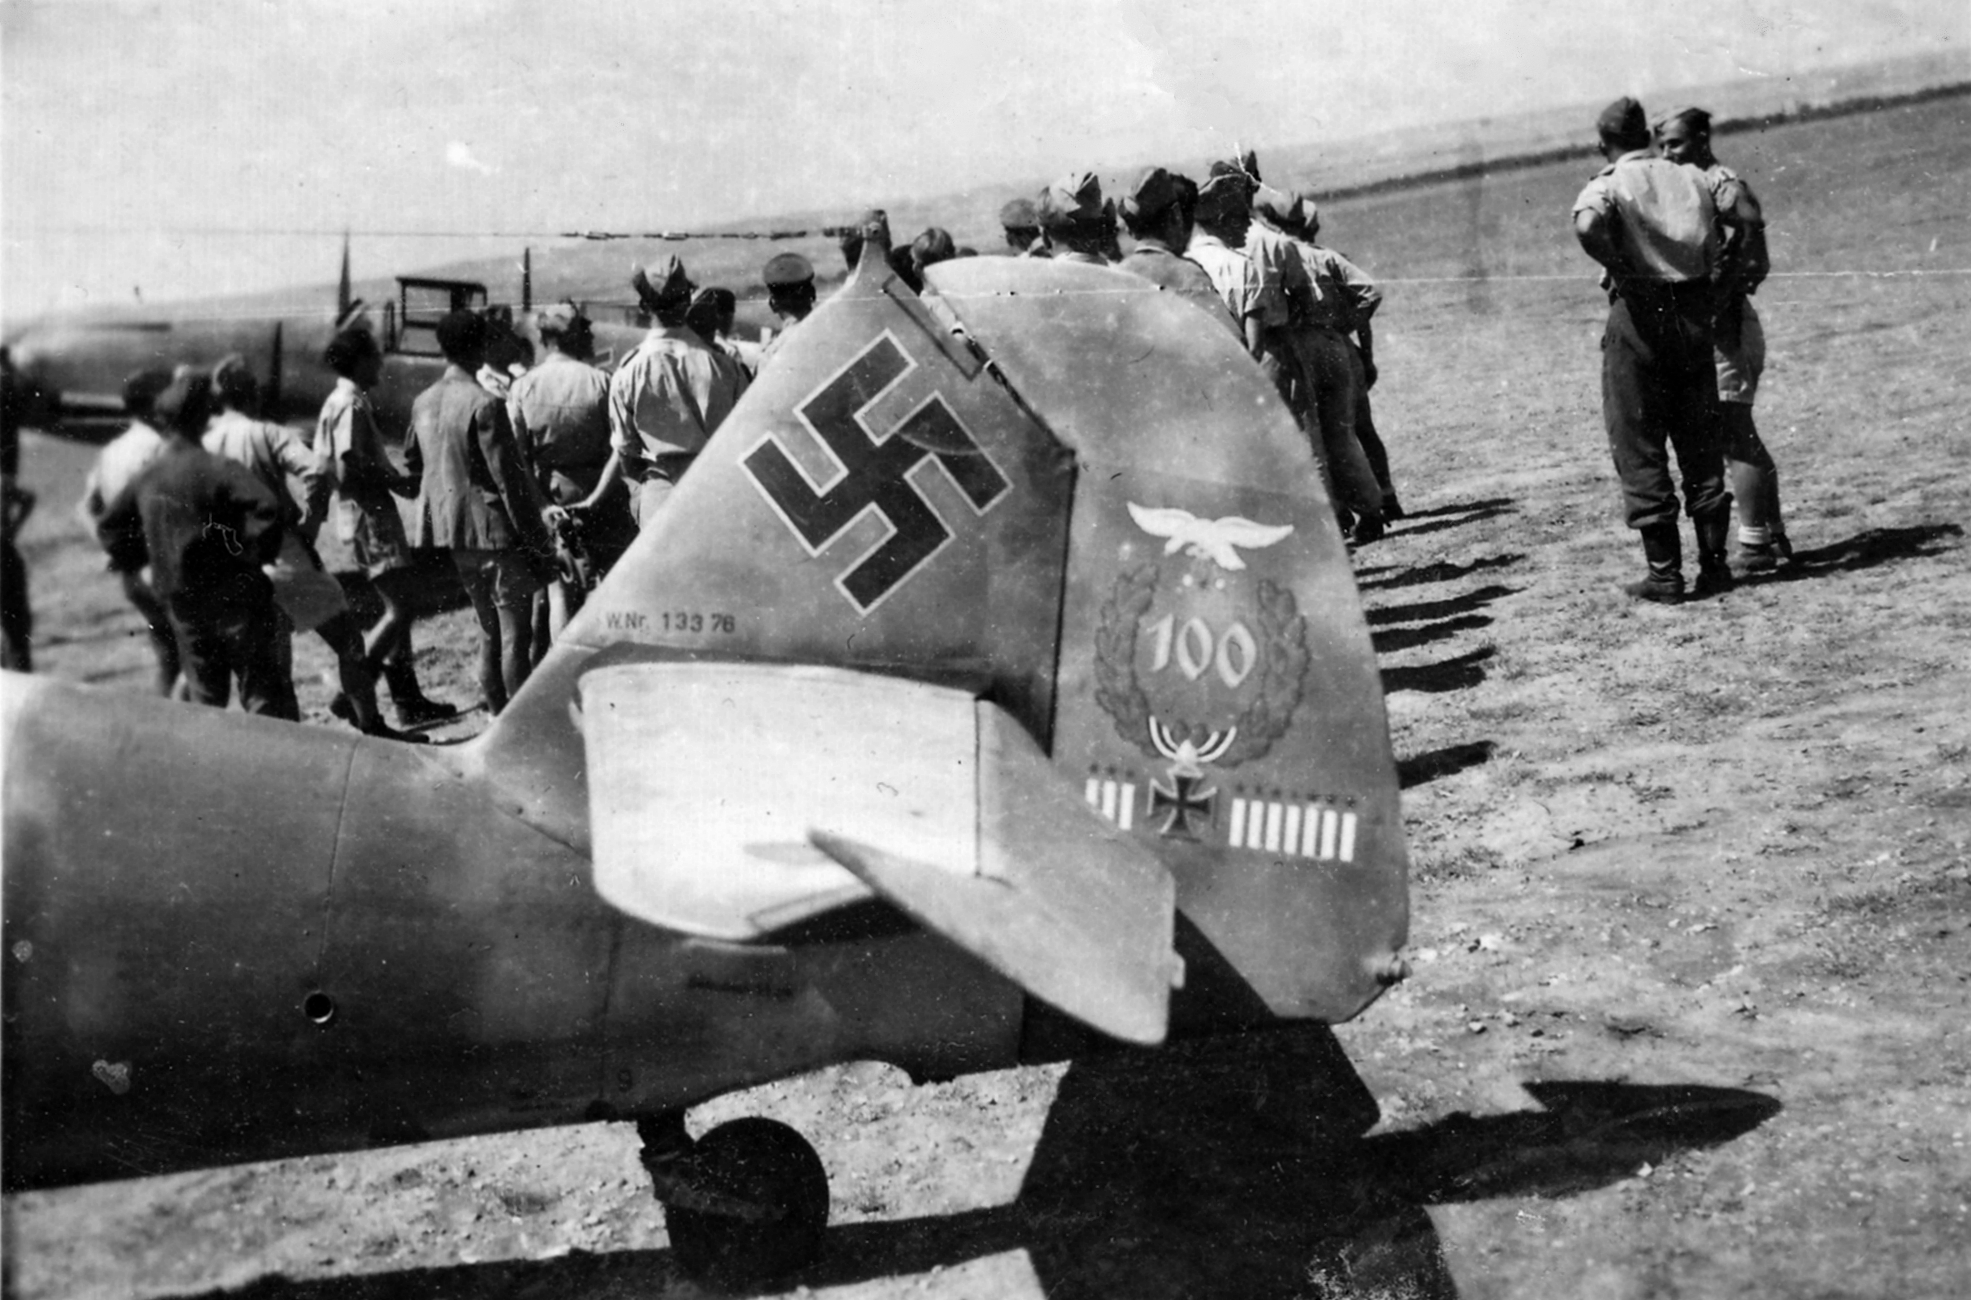 Heinrich Bär | Military Wiki | FANDOM powered by Wikia